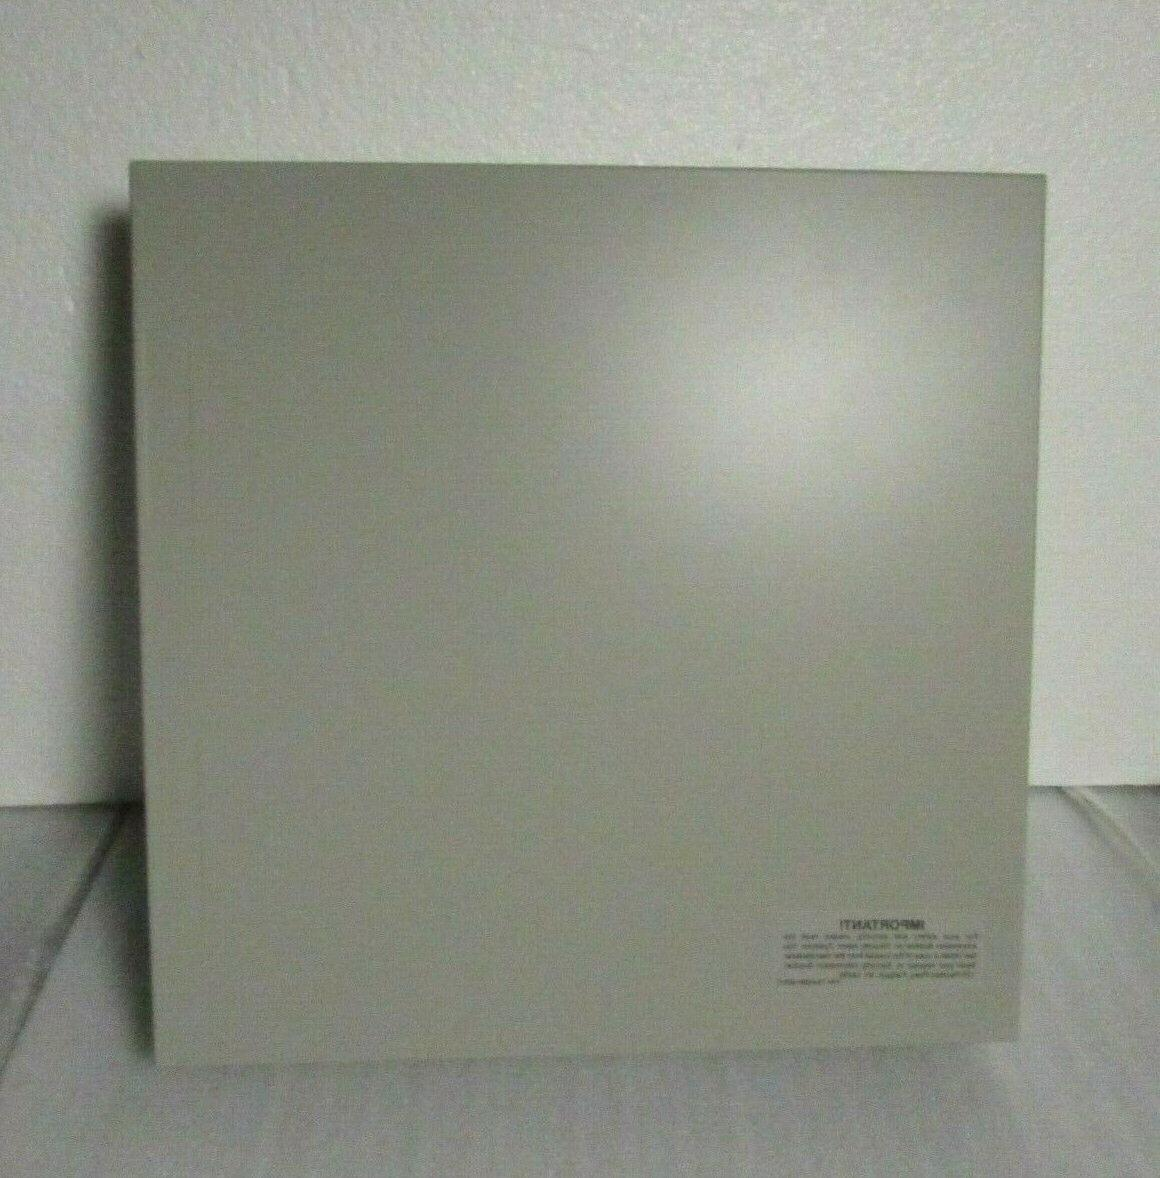 Bosch D8103 Intrusion Alarm